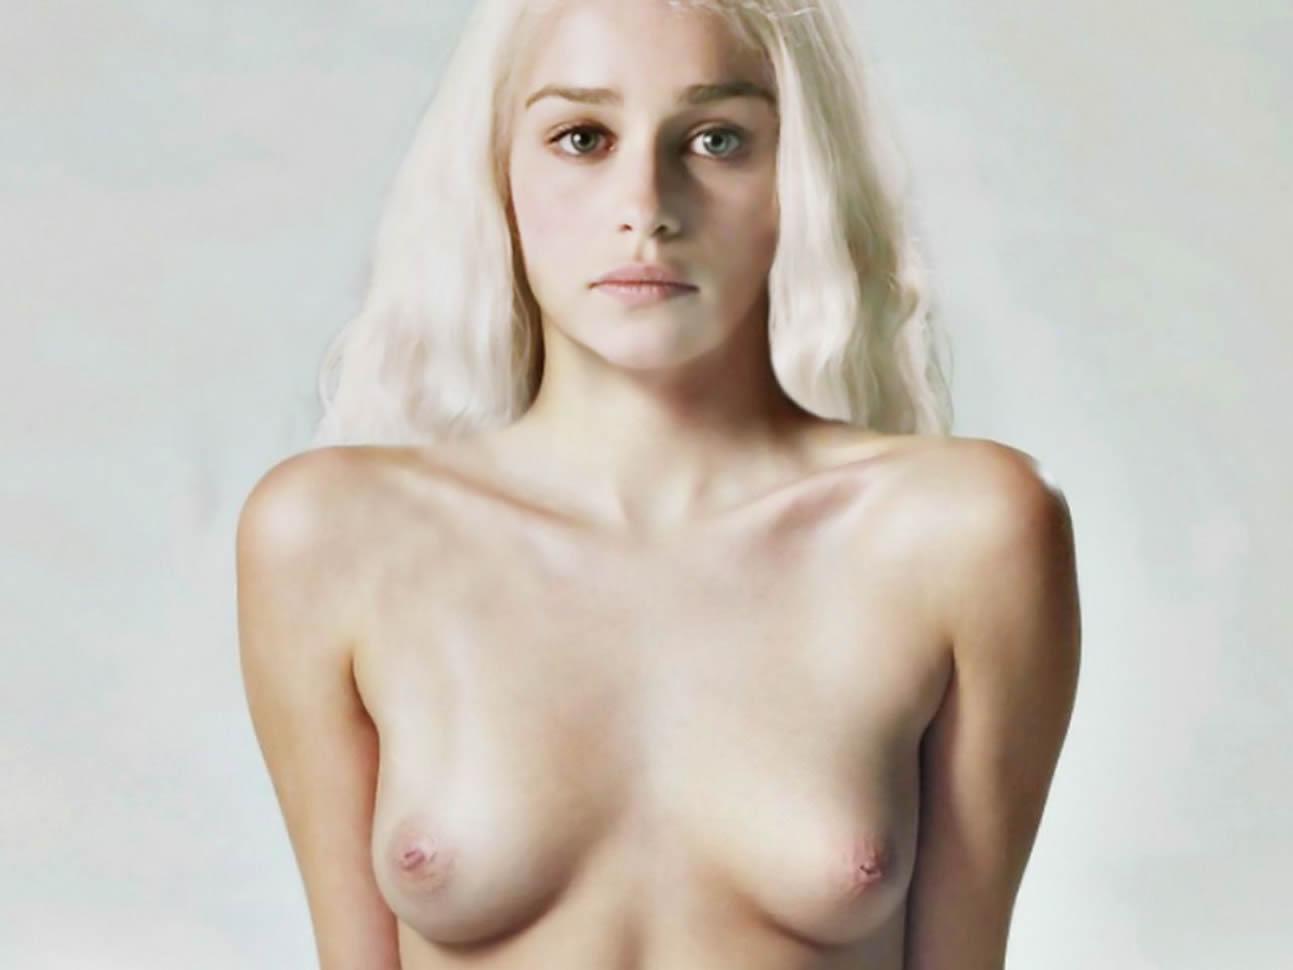 image Emilia clarke nude in voice from the stone scandalplanetcom